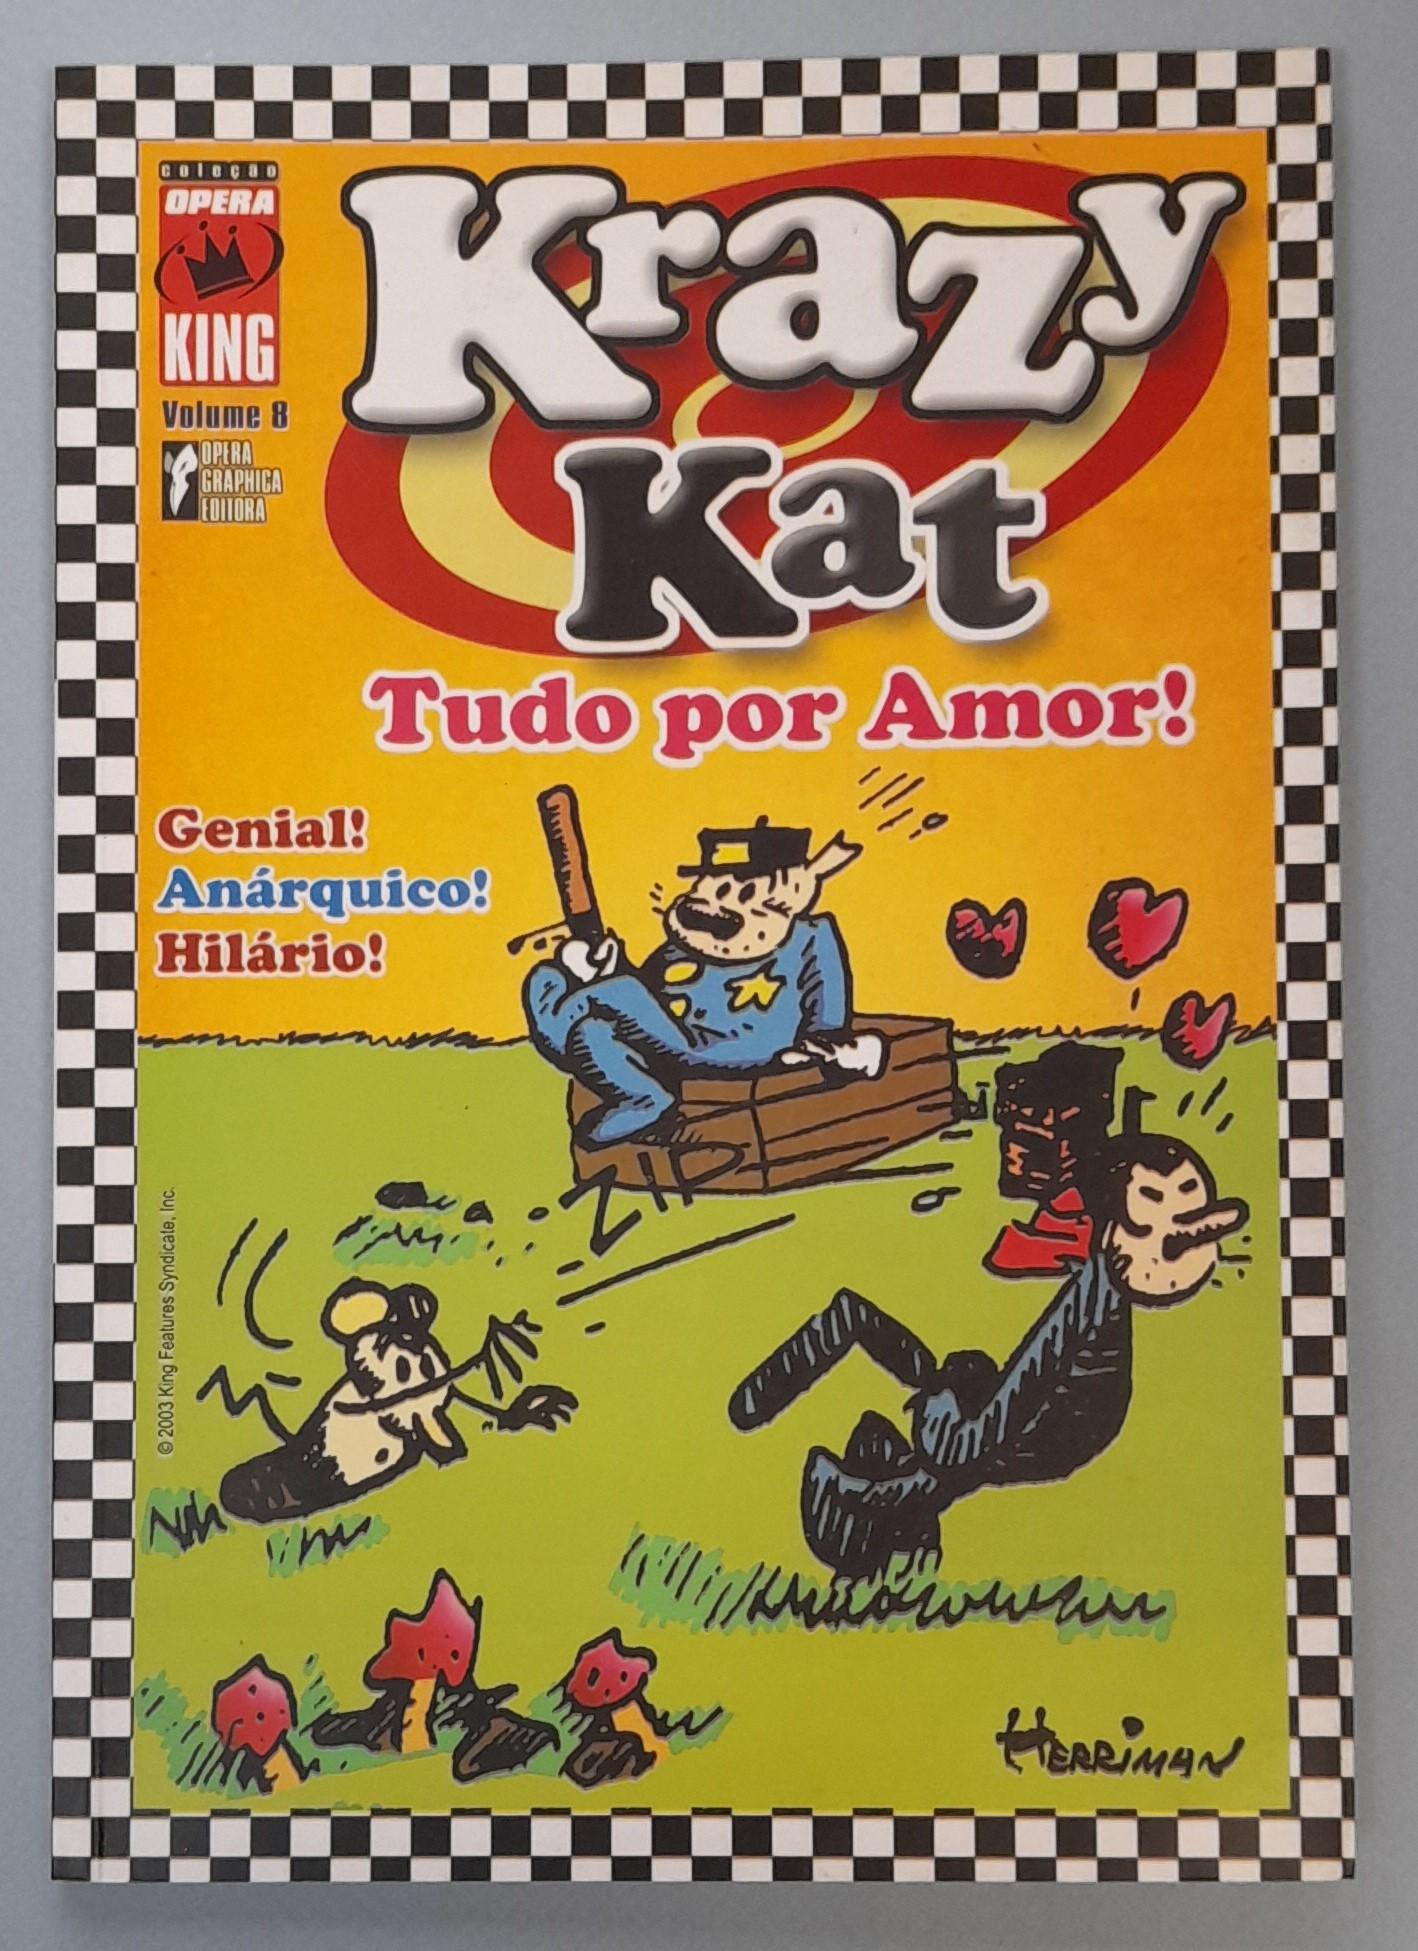 COLECÇÃO ÓPERA KING: KRAZY KAT